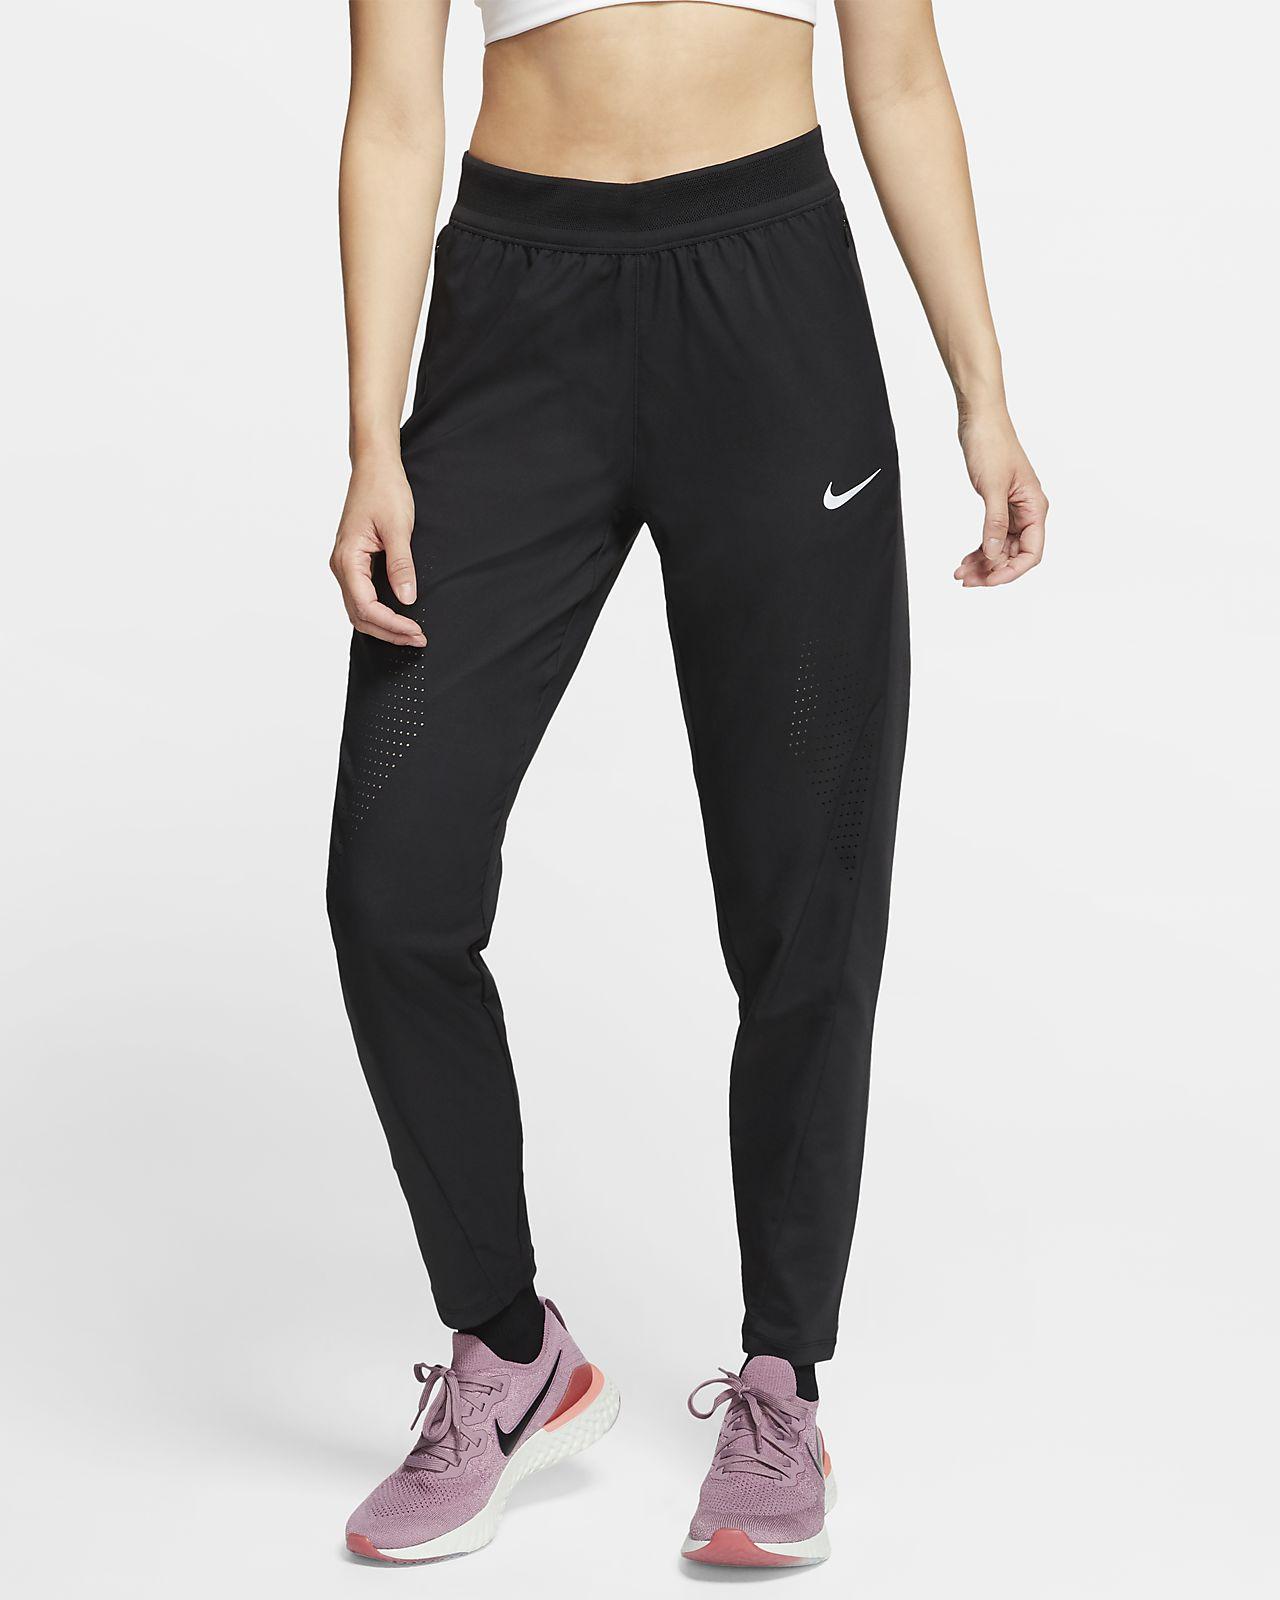 Nike Damen Laufhose Swift Laufhose Nike Damen Nike Swift 5A4Rqj3L